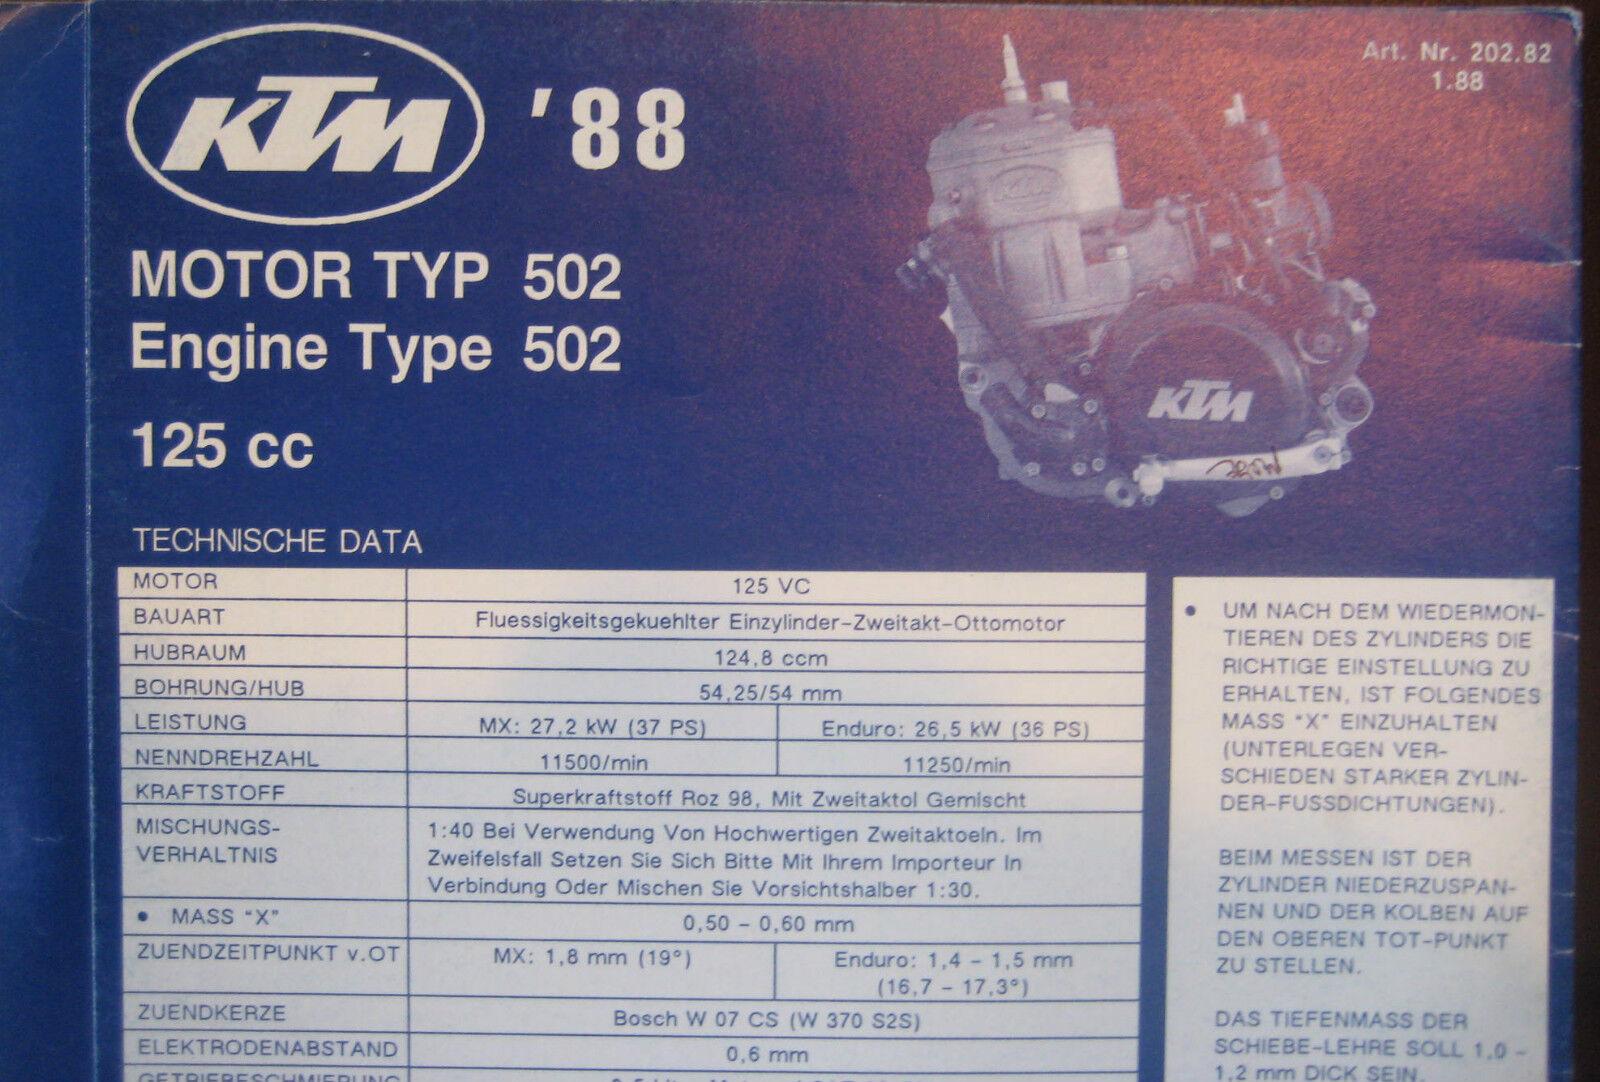 Ktm 1988 Part Number Diagram Poster Engine Type 502 125 Cc Diagrams Motorcycle Manual